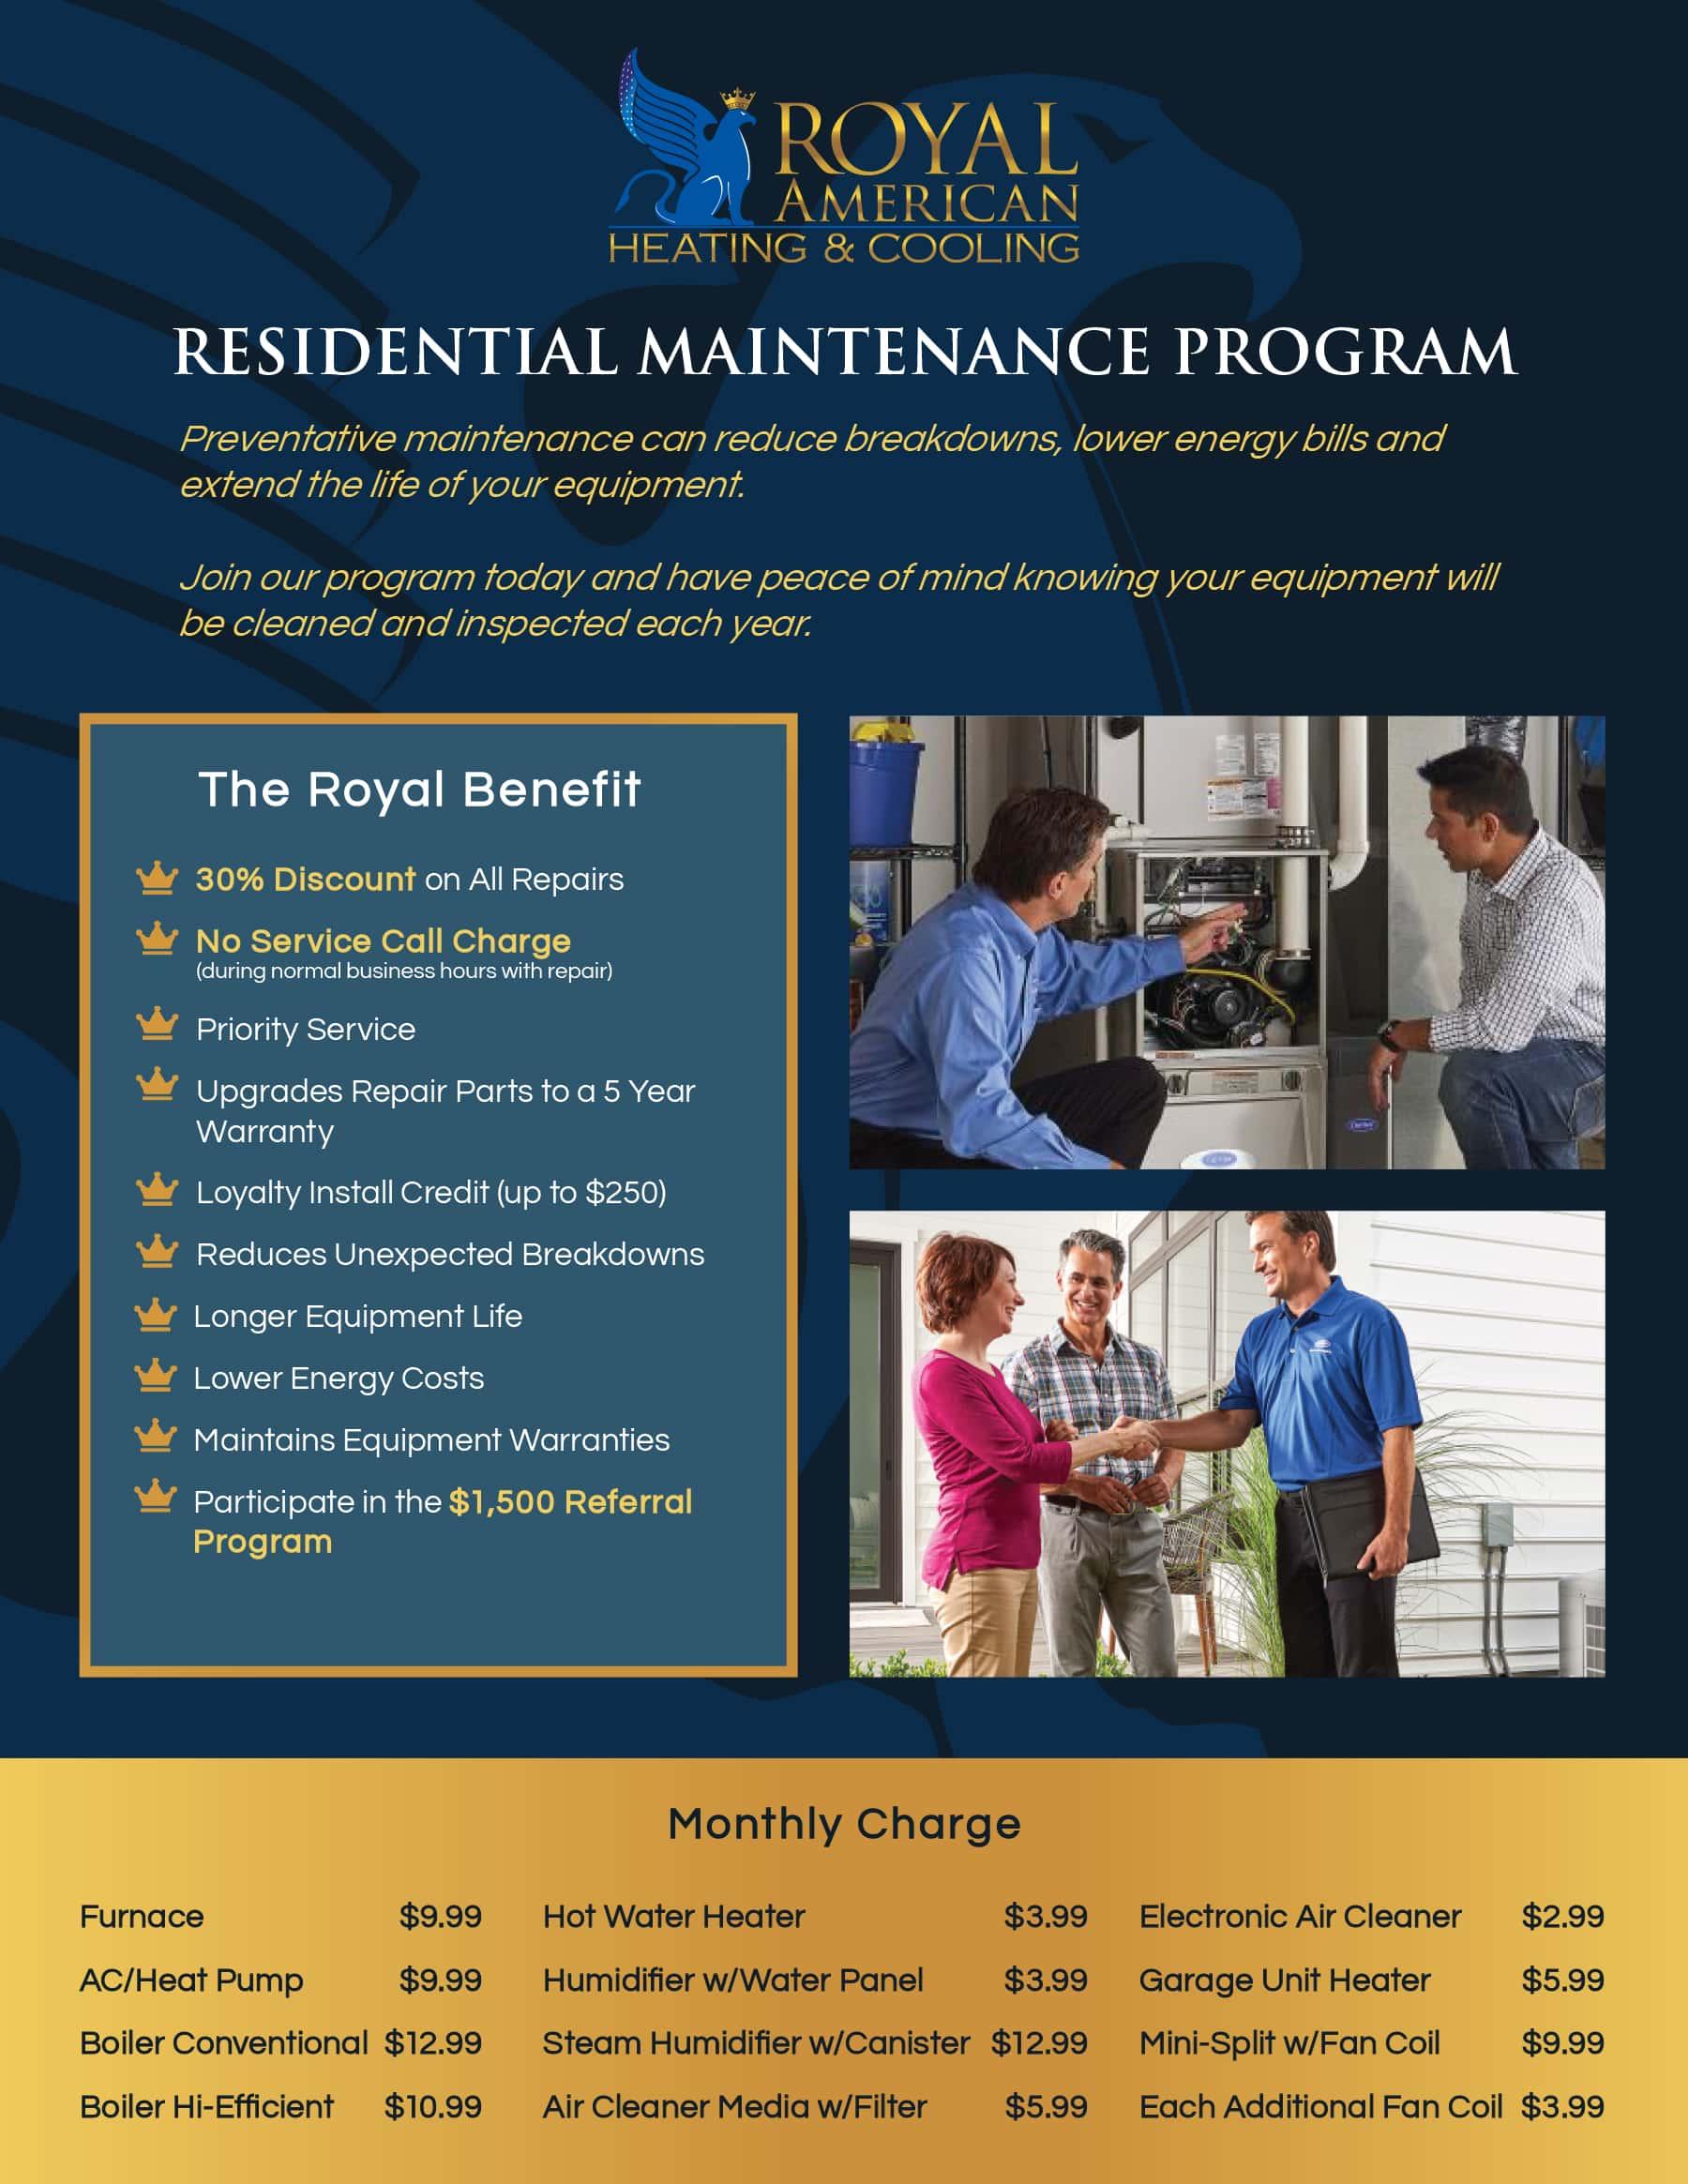 ROY-Res-Maintenance-FL-2